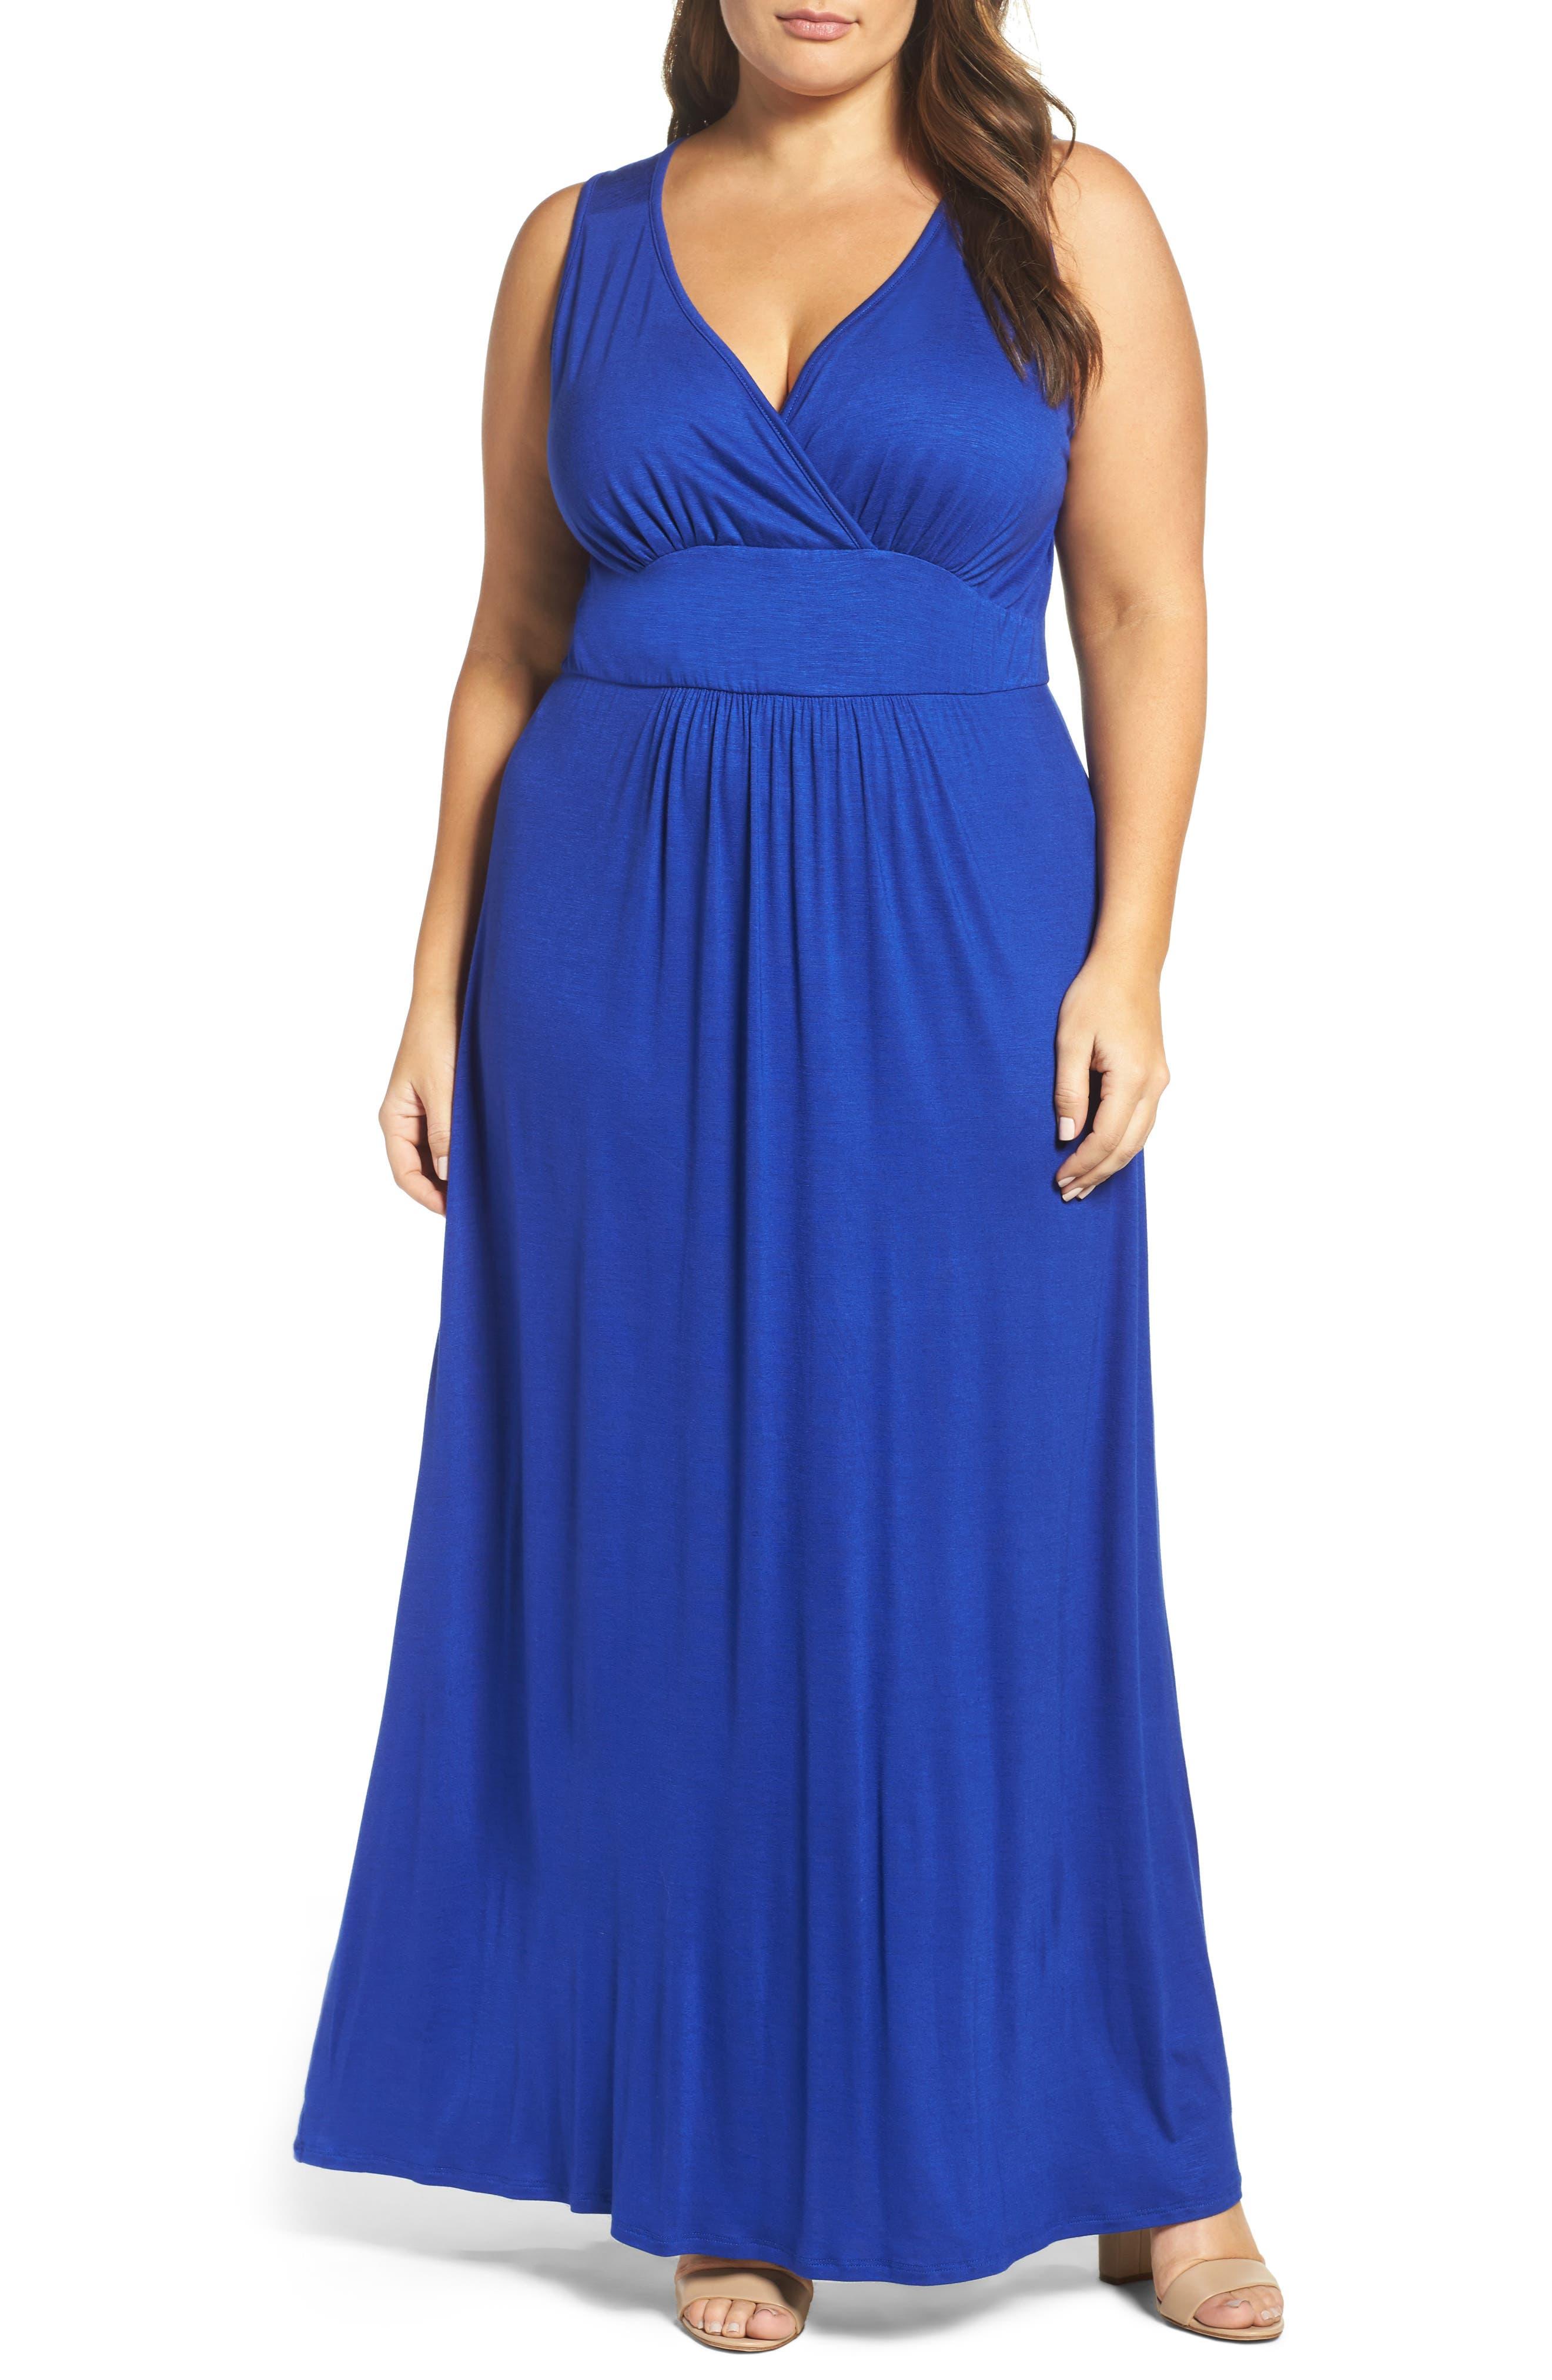 Alternate Image 1 Selected - Loveappella Surplice Maxi Dress (Plus Size)